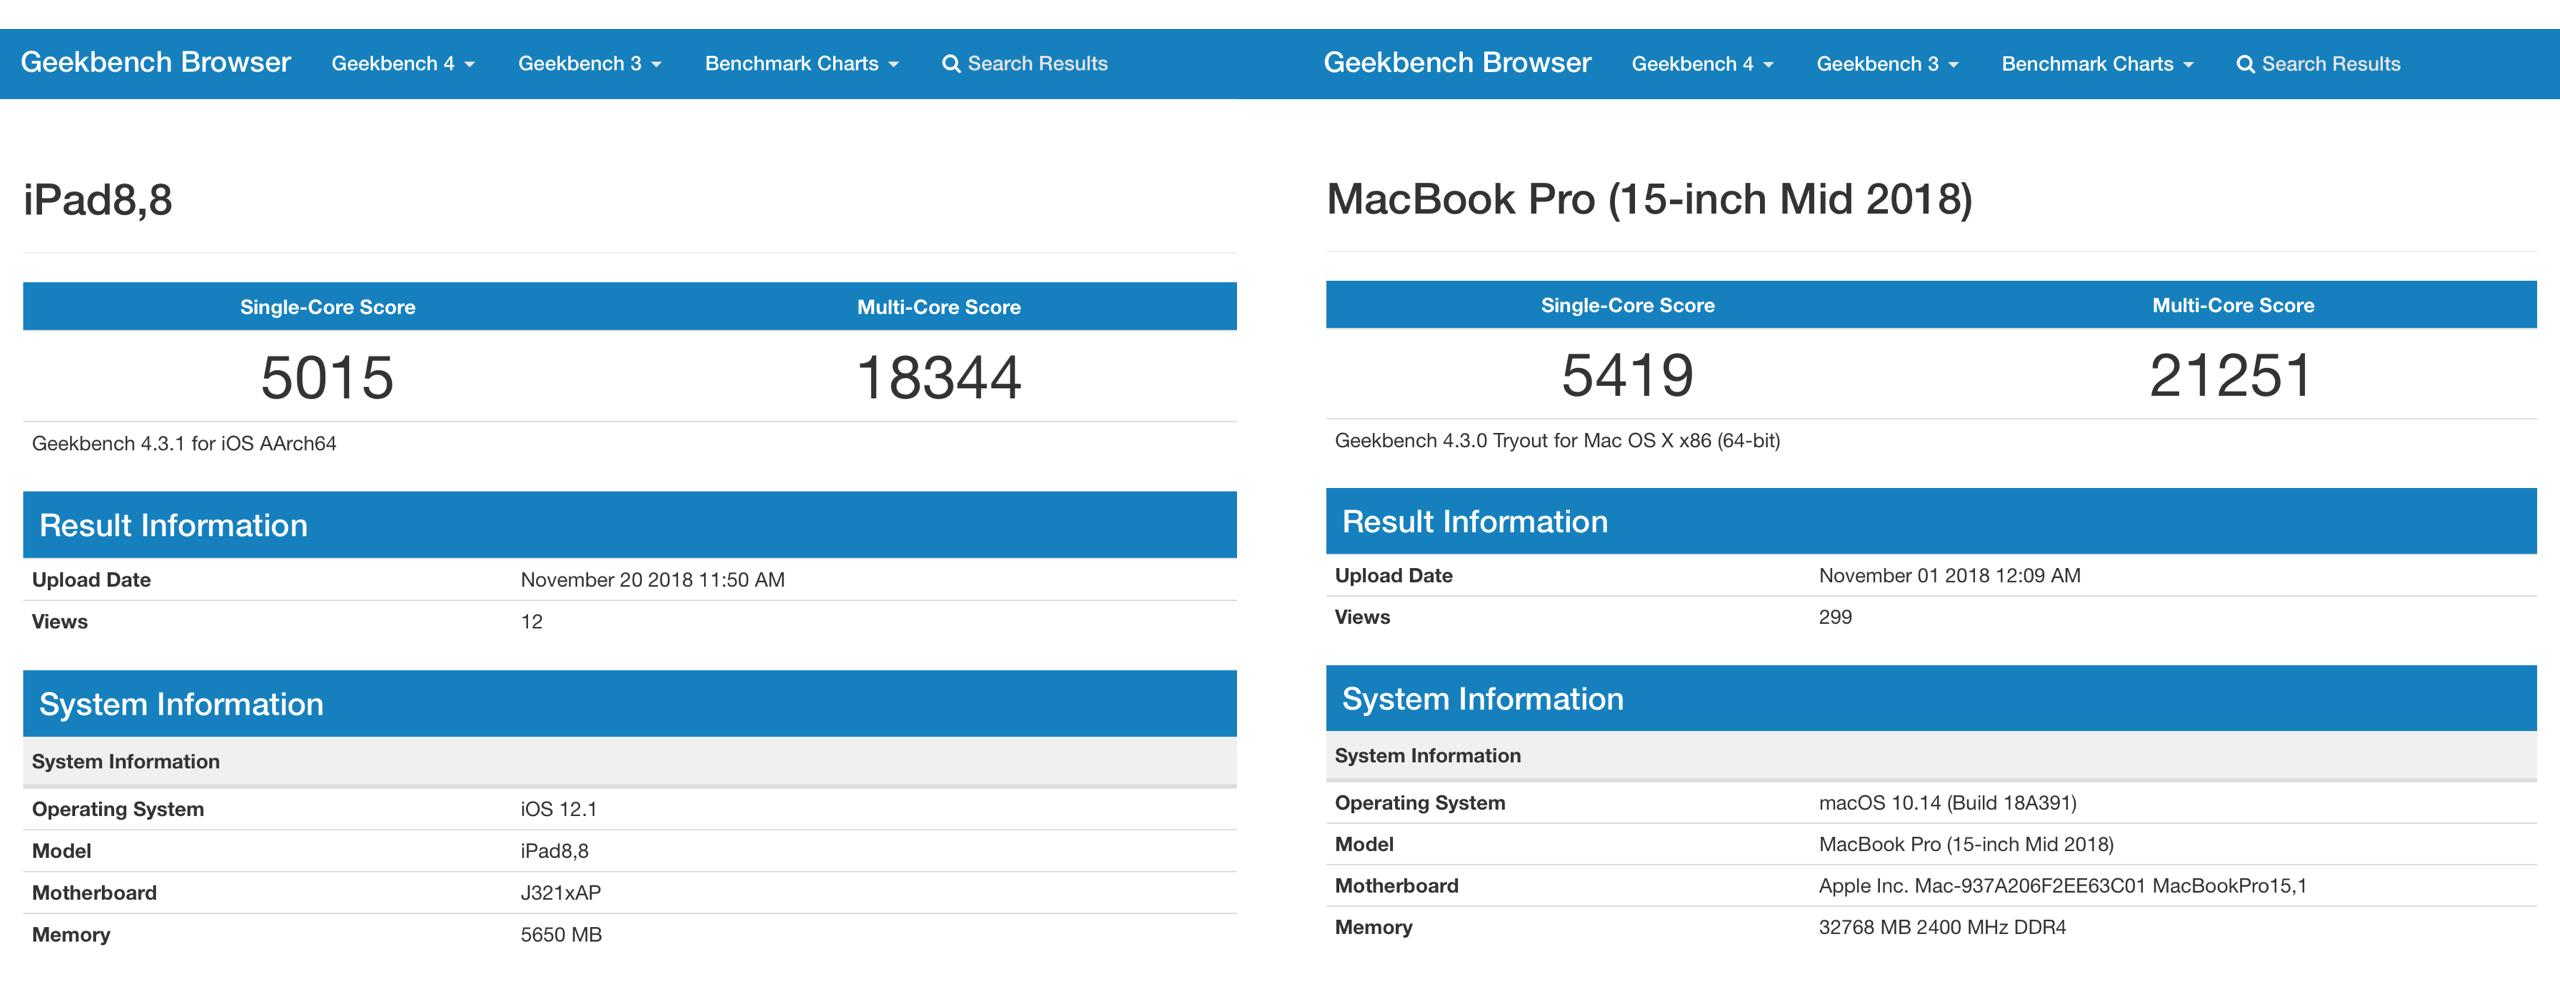 iPad Pro 2018 vs MacBook Pro 2018 Geekbench